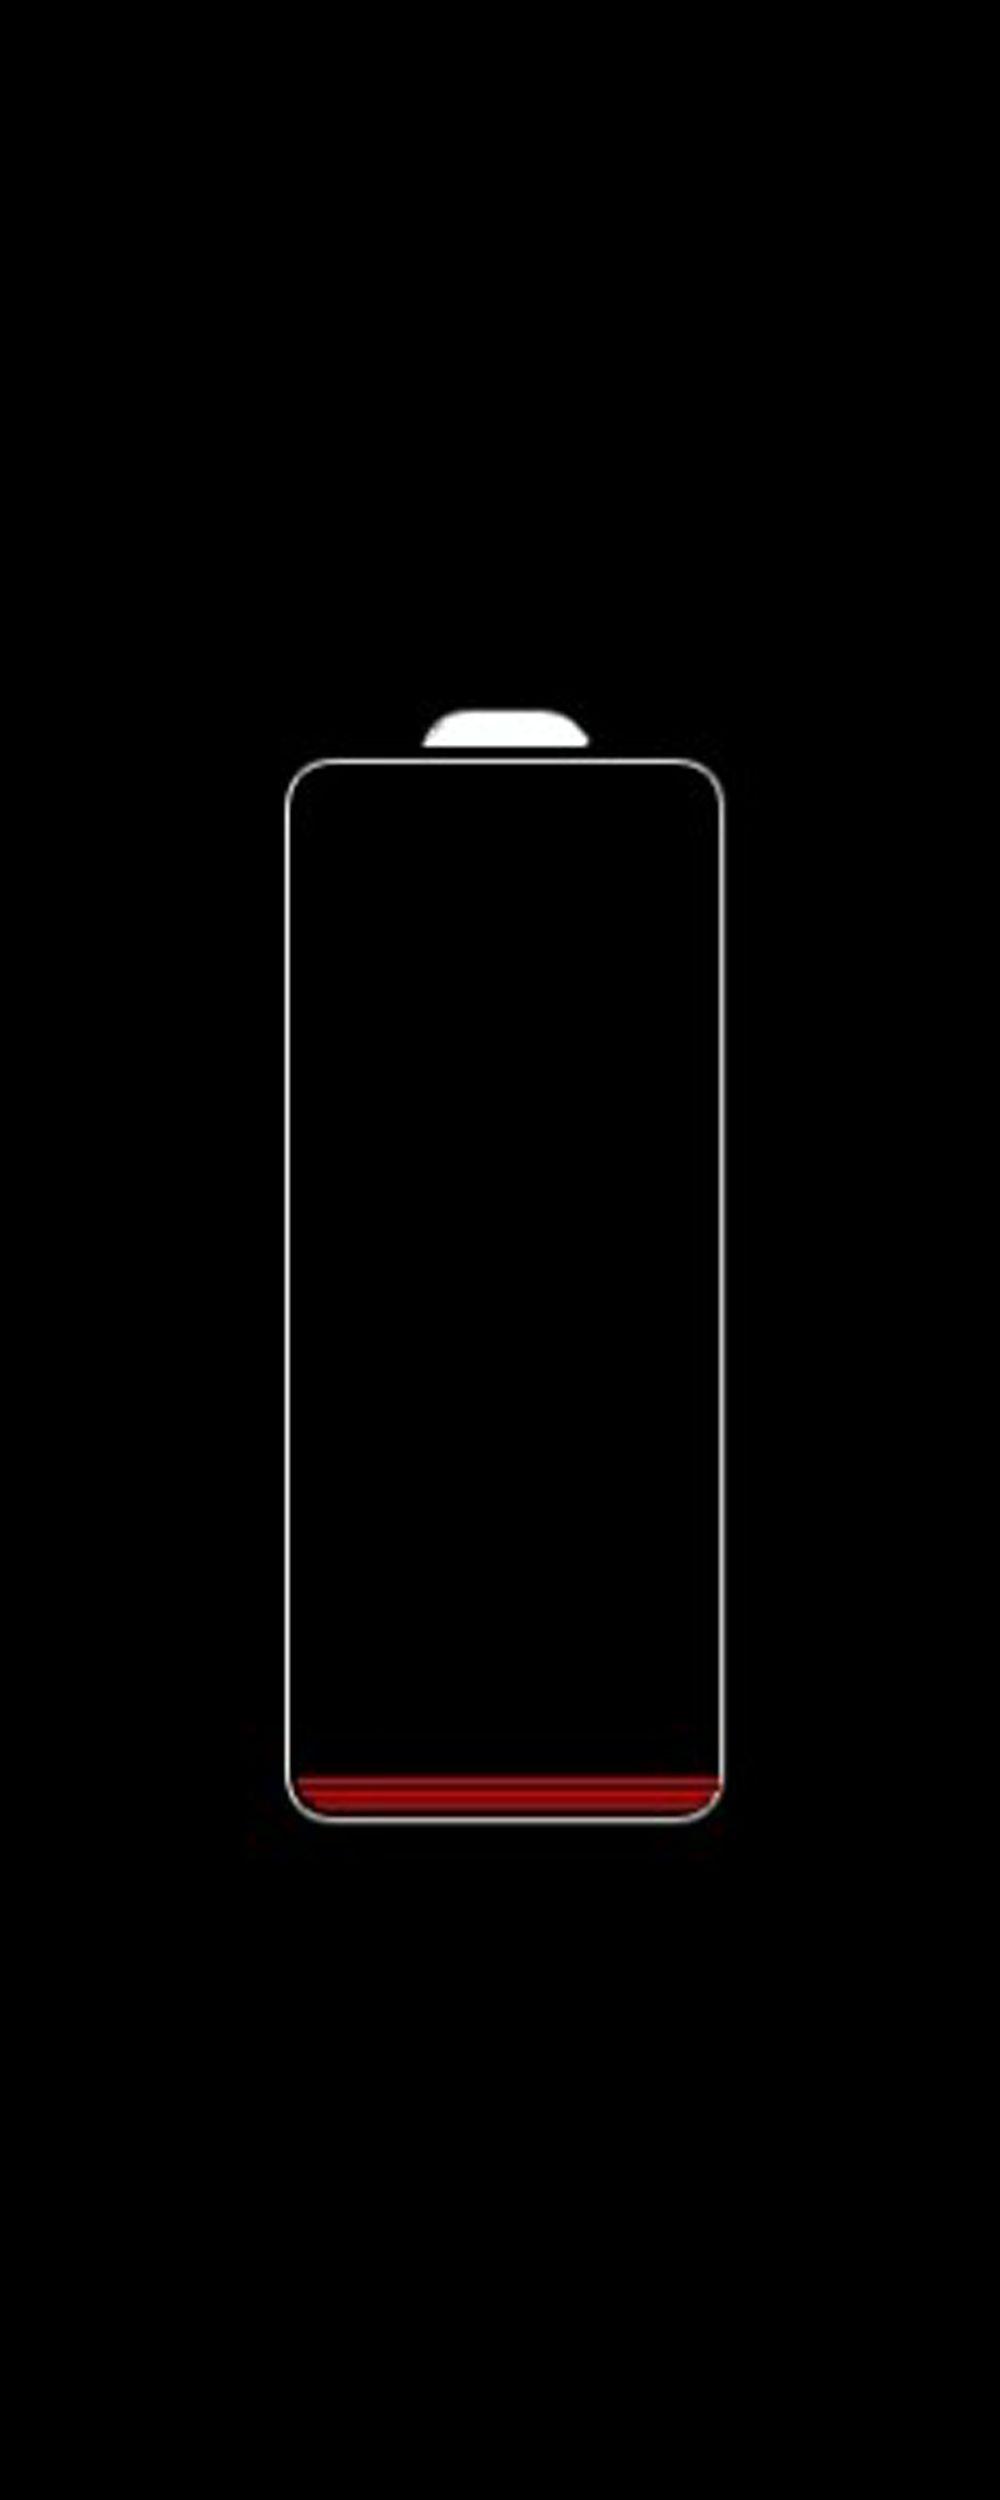 Omg Stop Using This Battery Saving Trick Immediately It S Bad News Dark Wallpaper Iphone Iphone Wallpaper Logo Phone Wallpaper Images